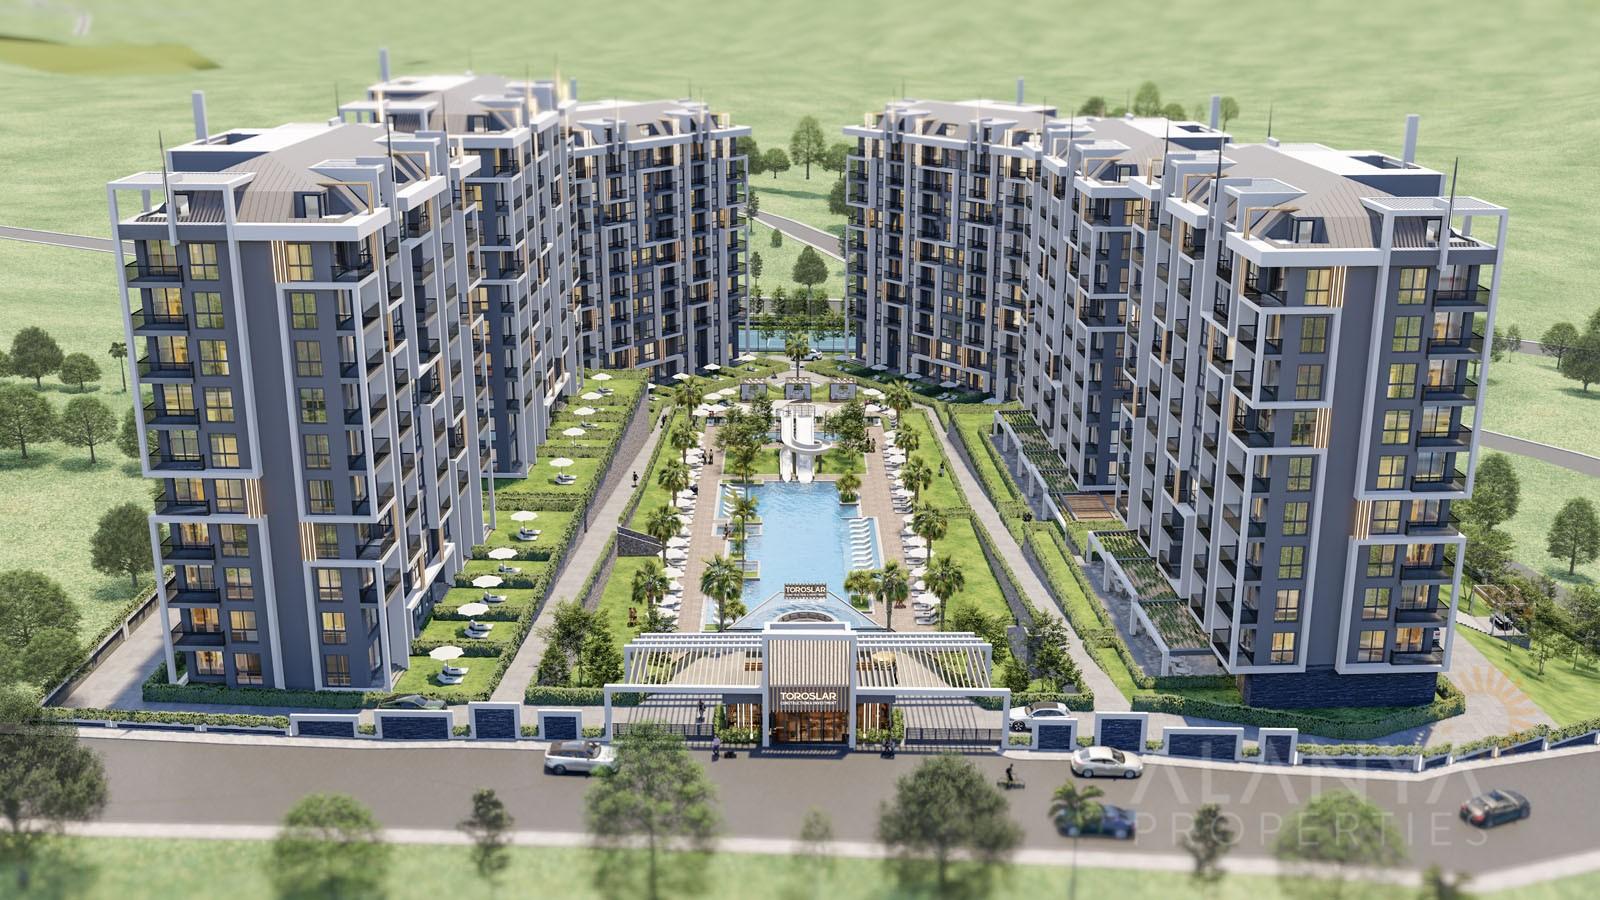 Ultramoderne Moderne Nouveau Complexe - Emerald Grand Deluxe